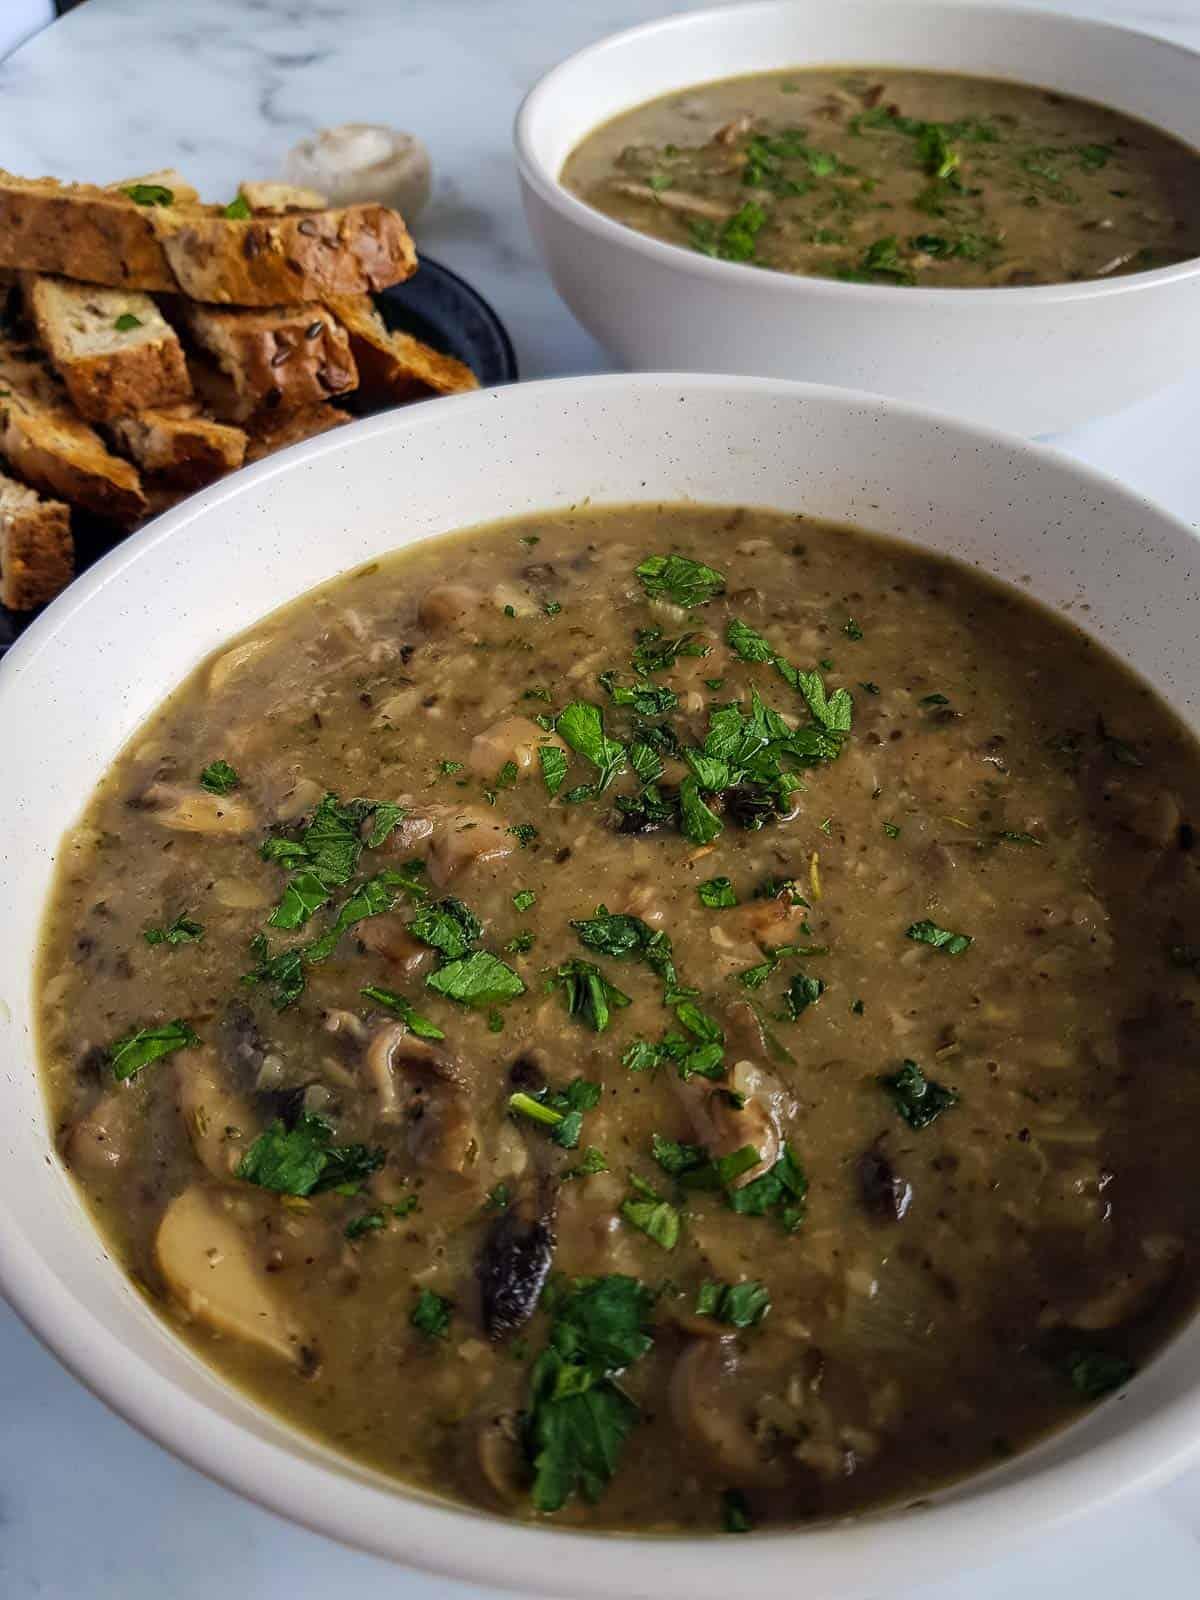 Close up of a rich mushroom soup.